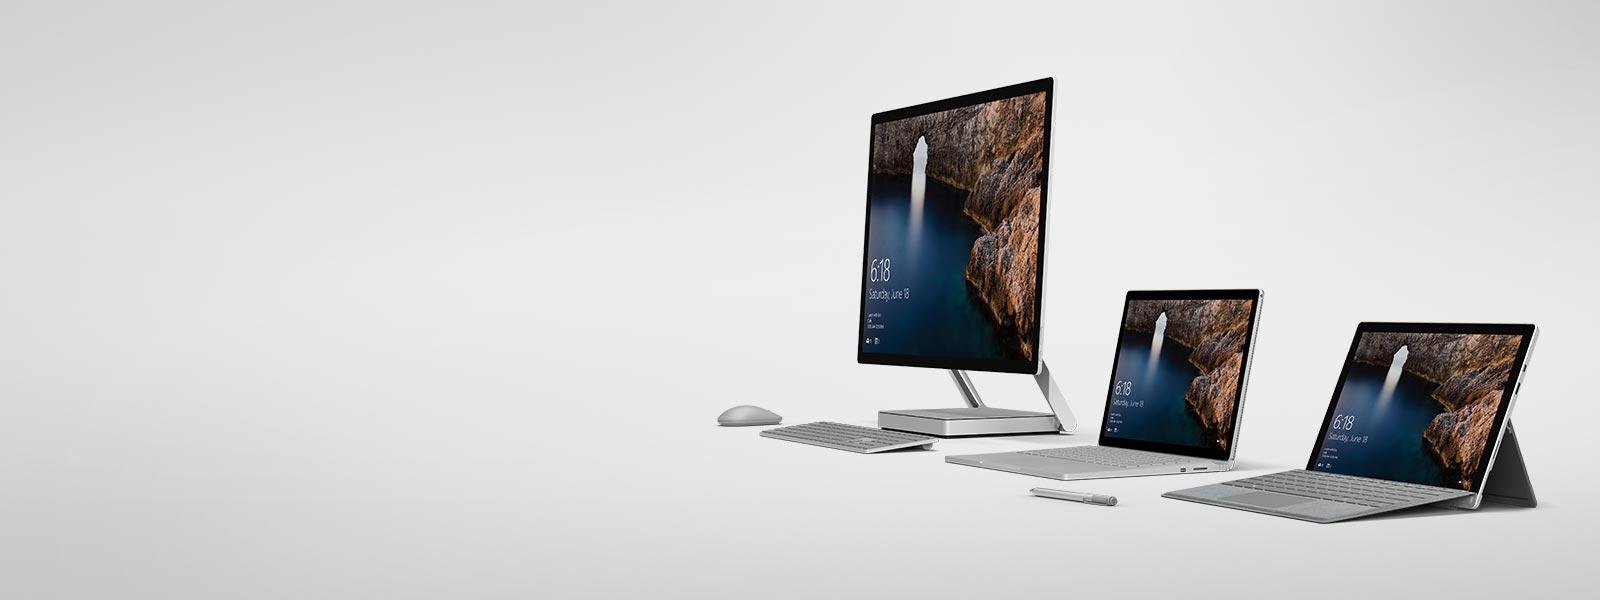 Introducing Surface Studio